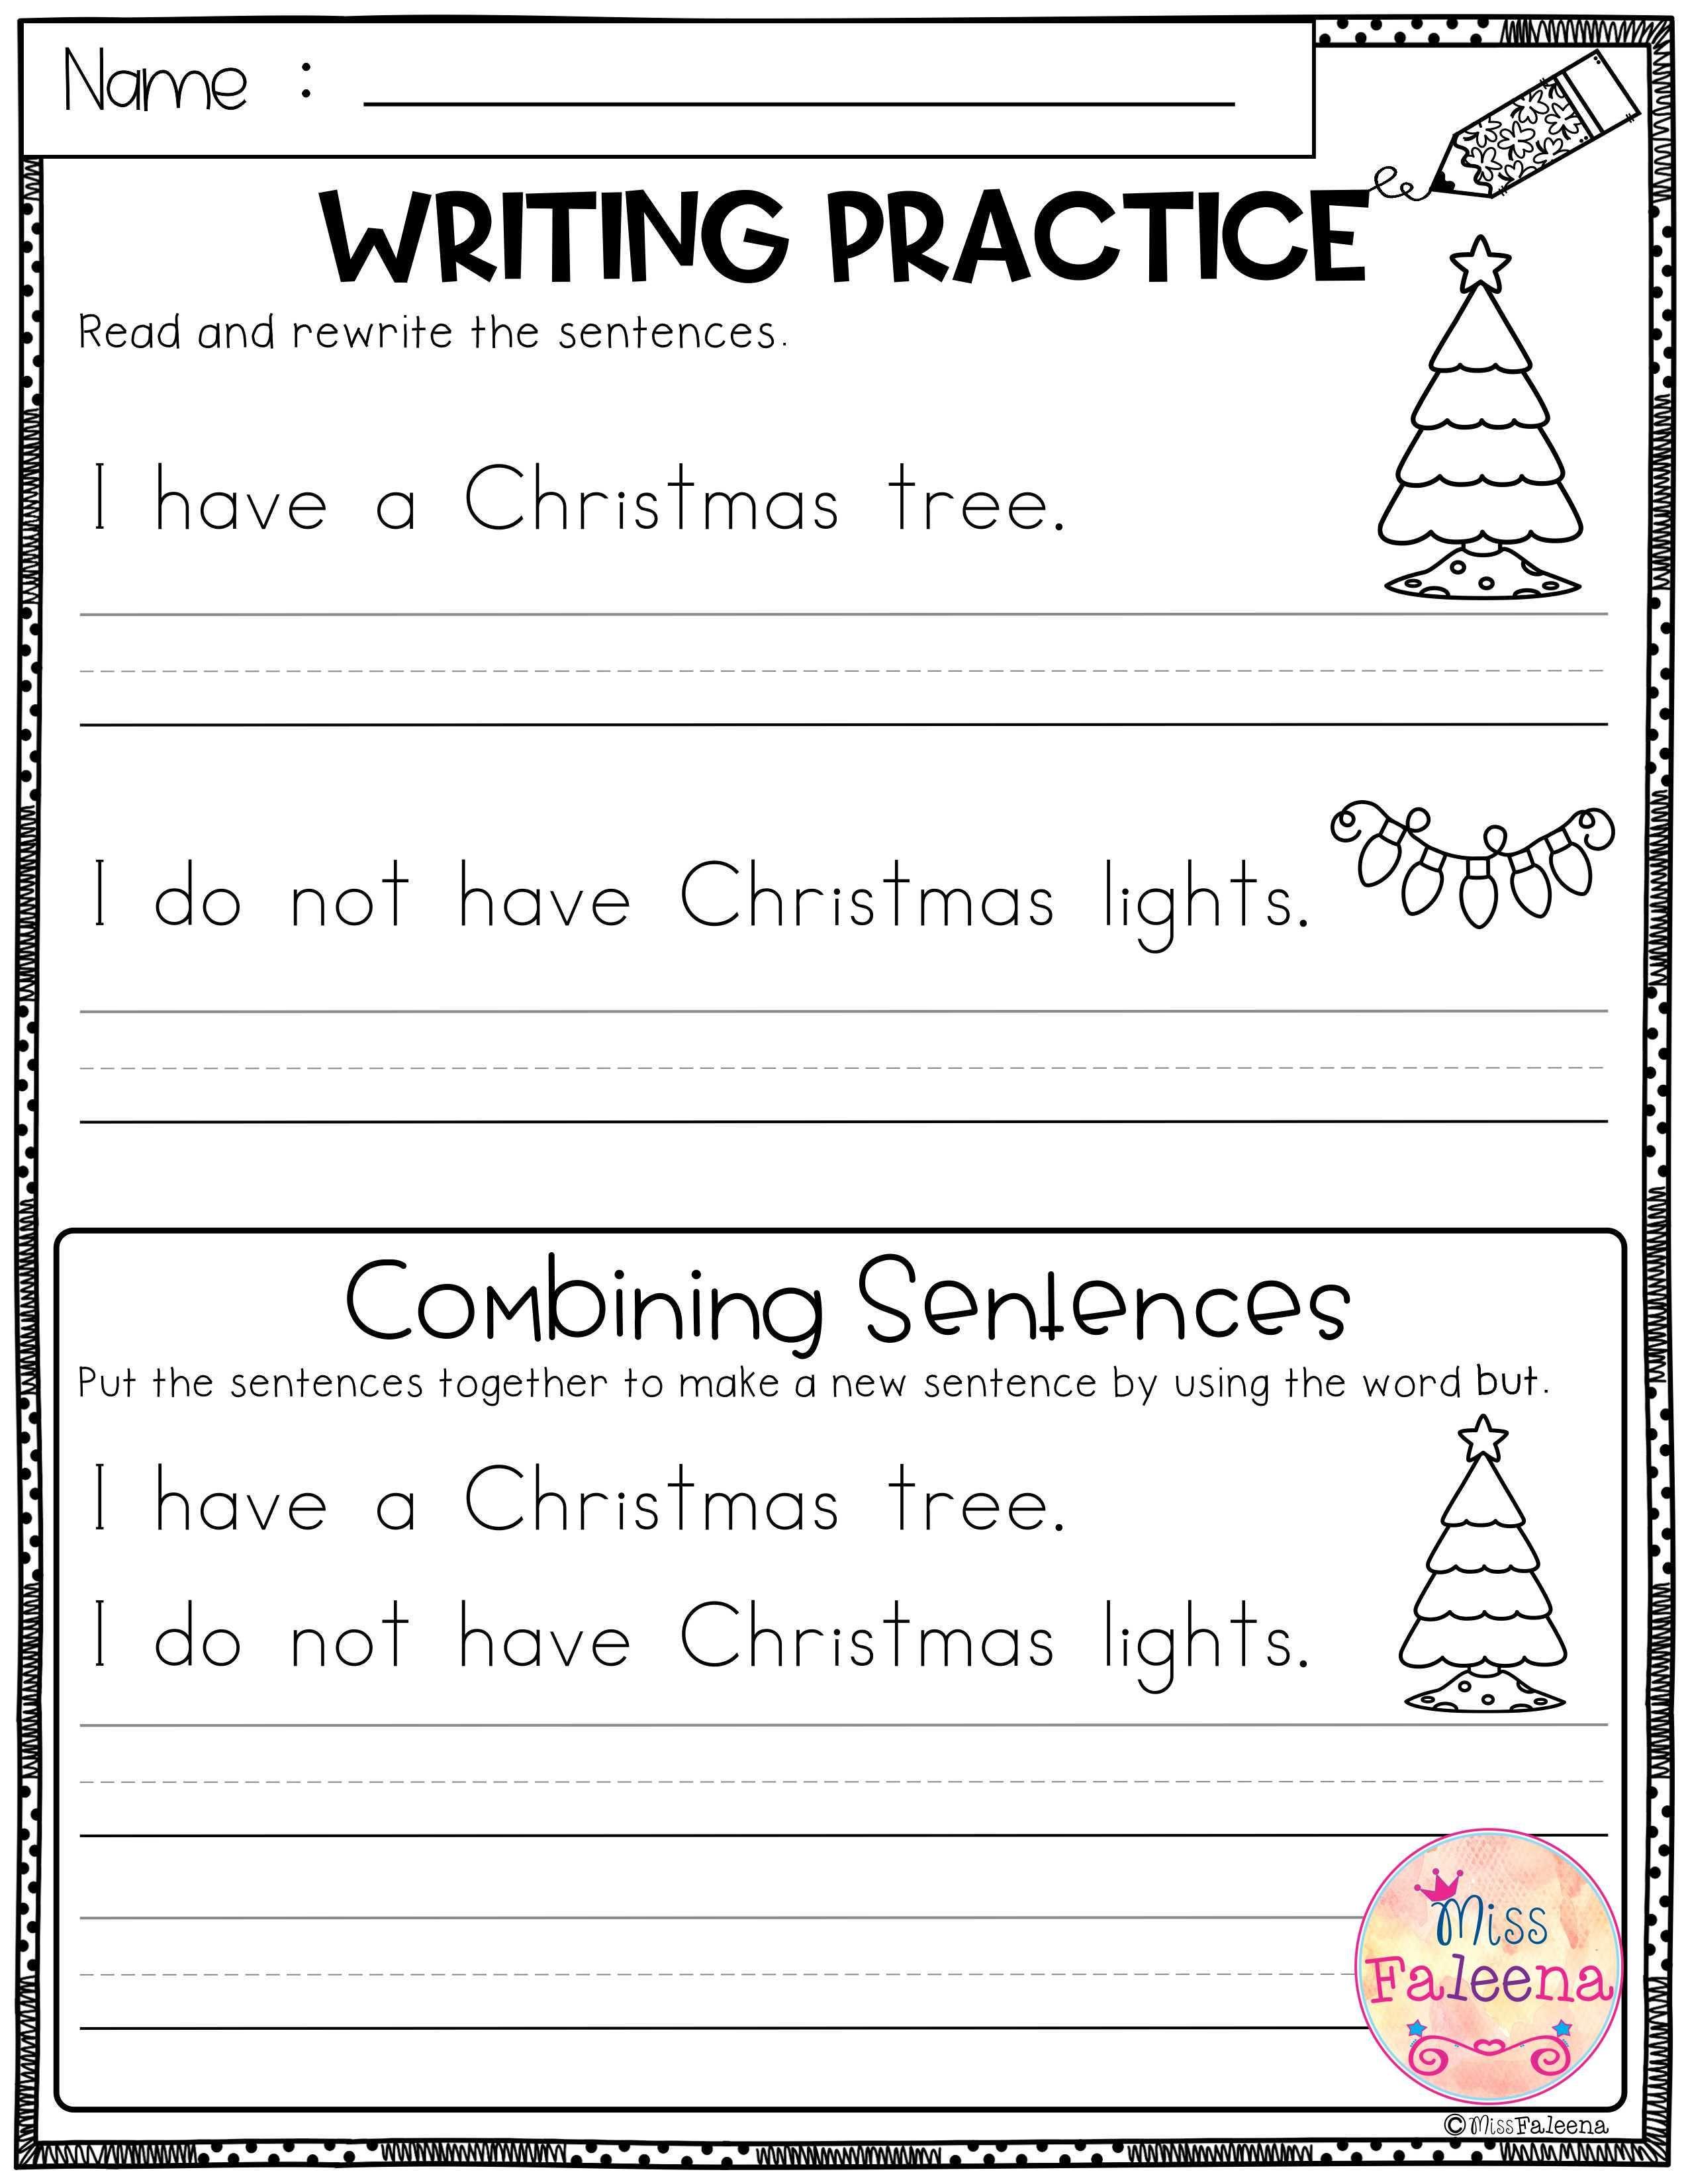 December Writing Practice Combining Sentences